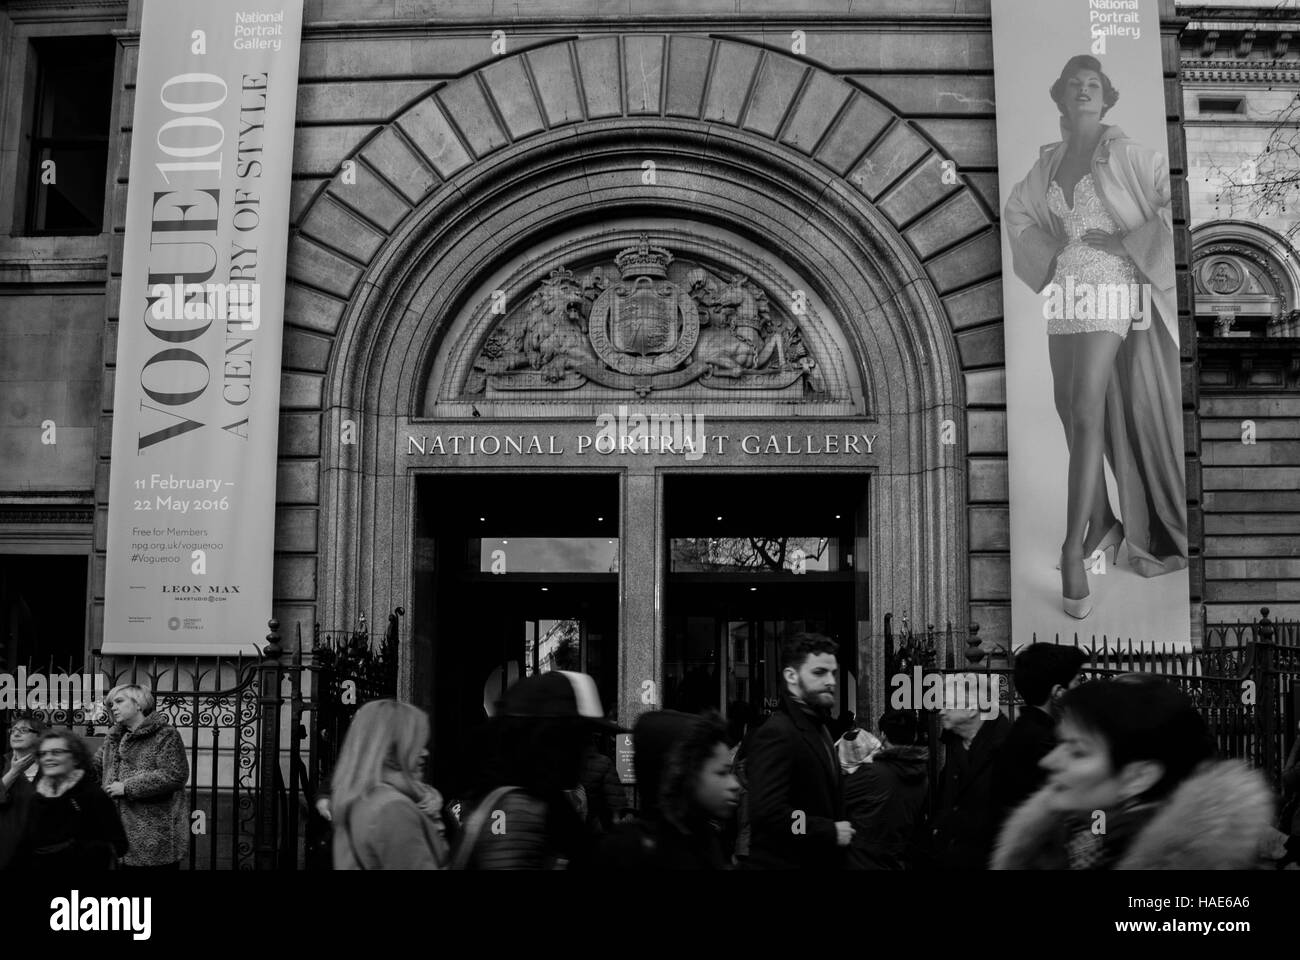 National Portrait Gallery Feb 2016 - Stock Image